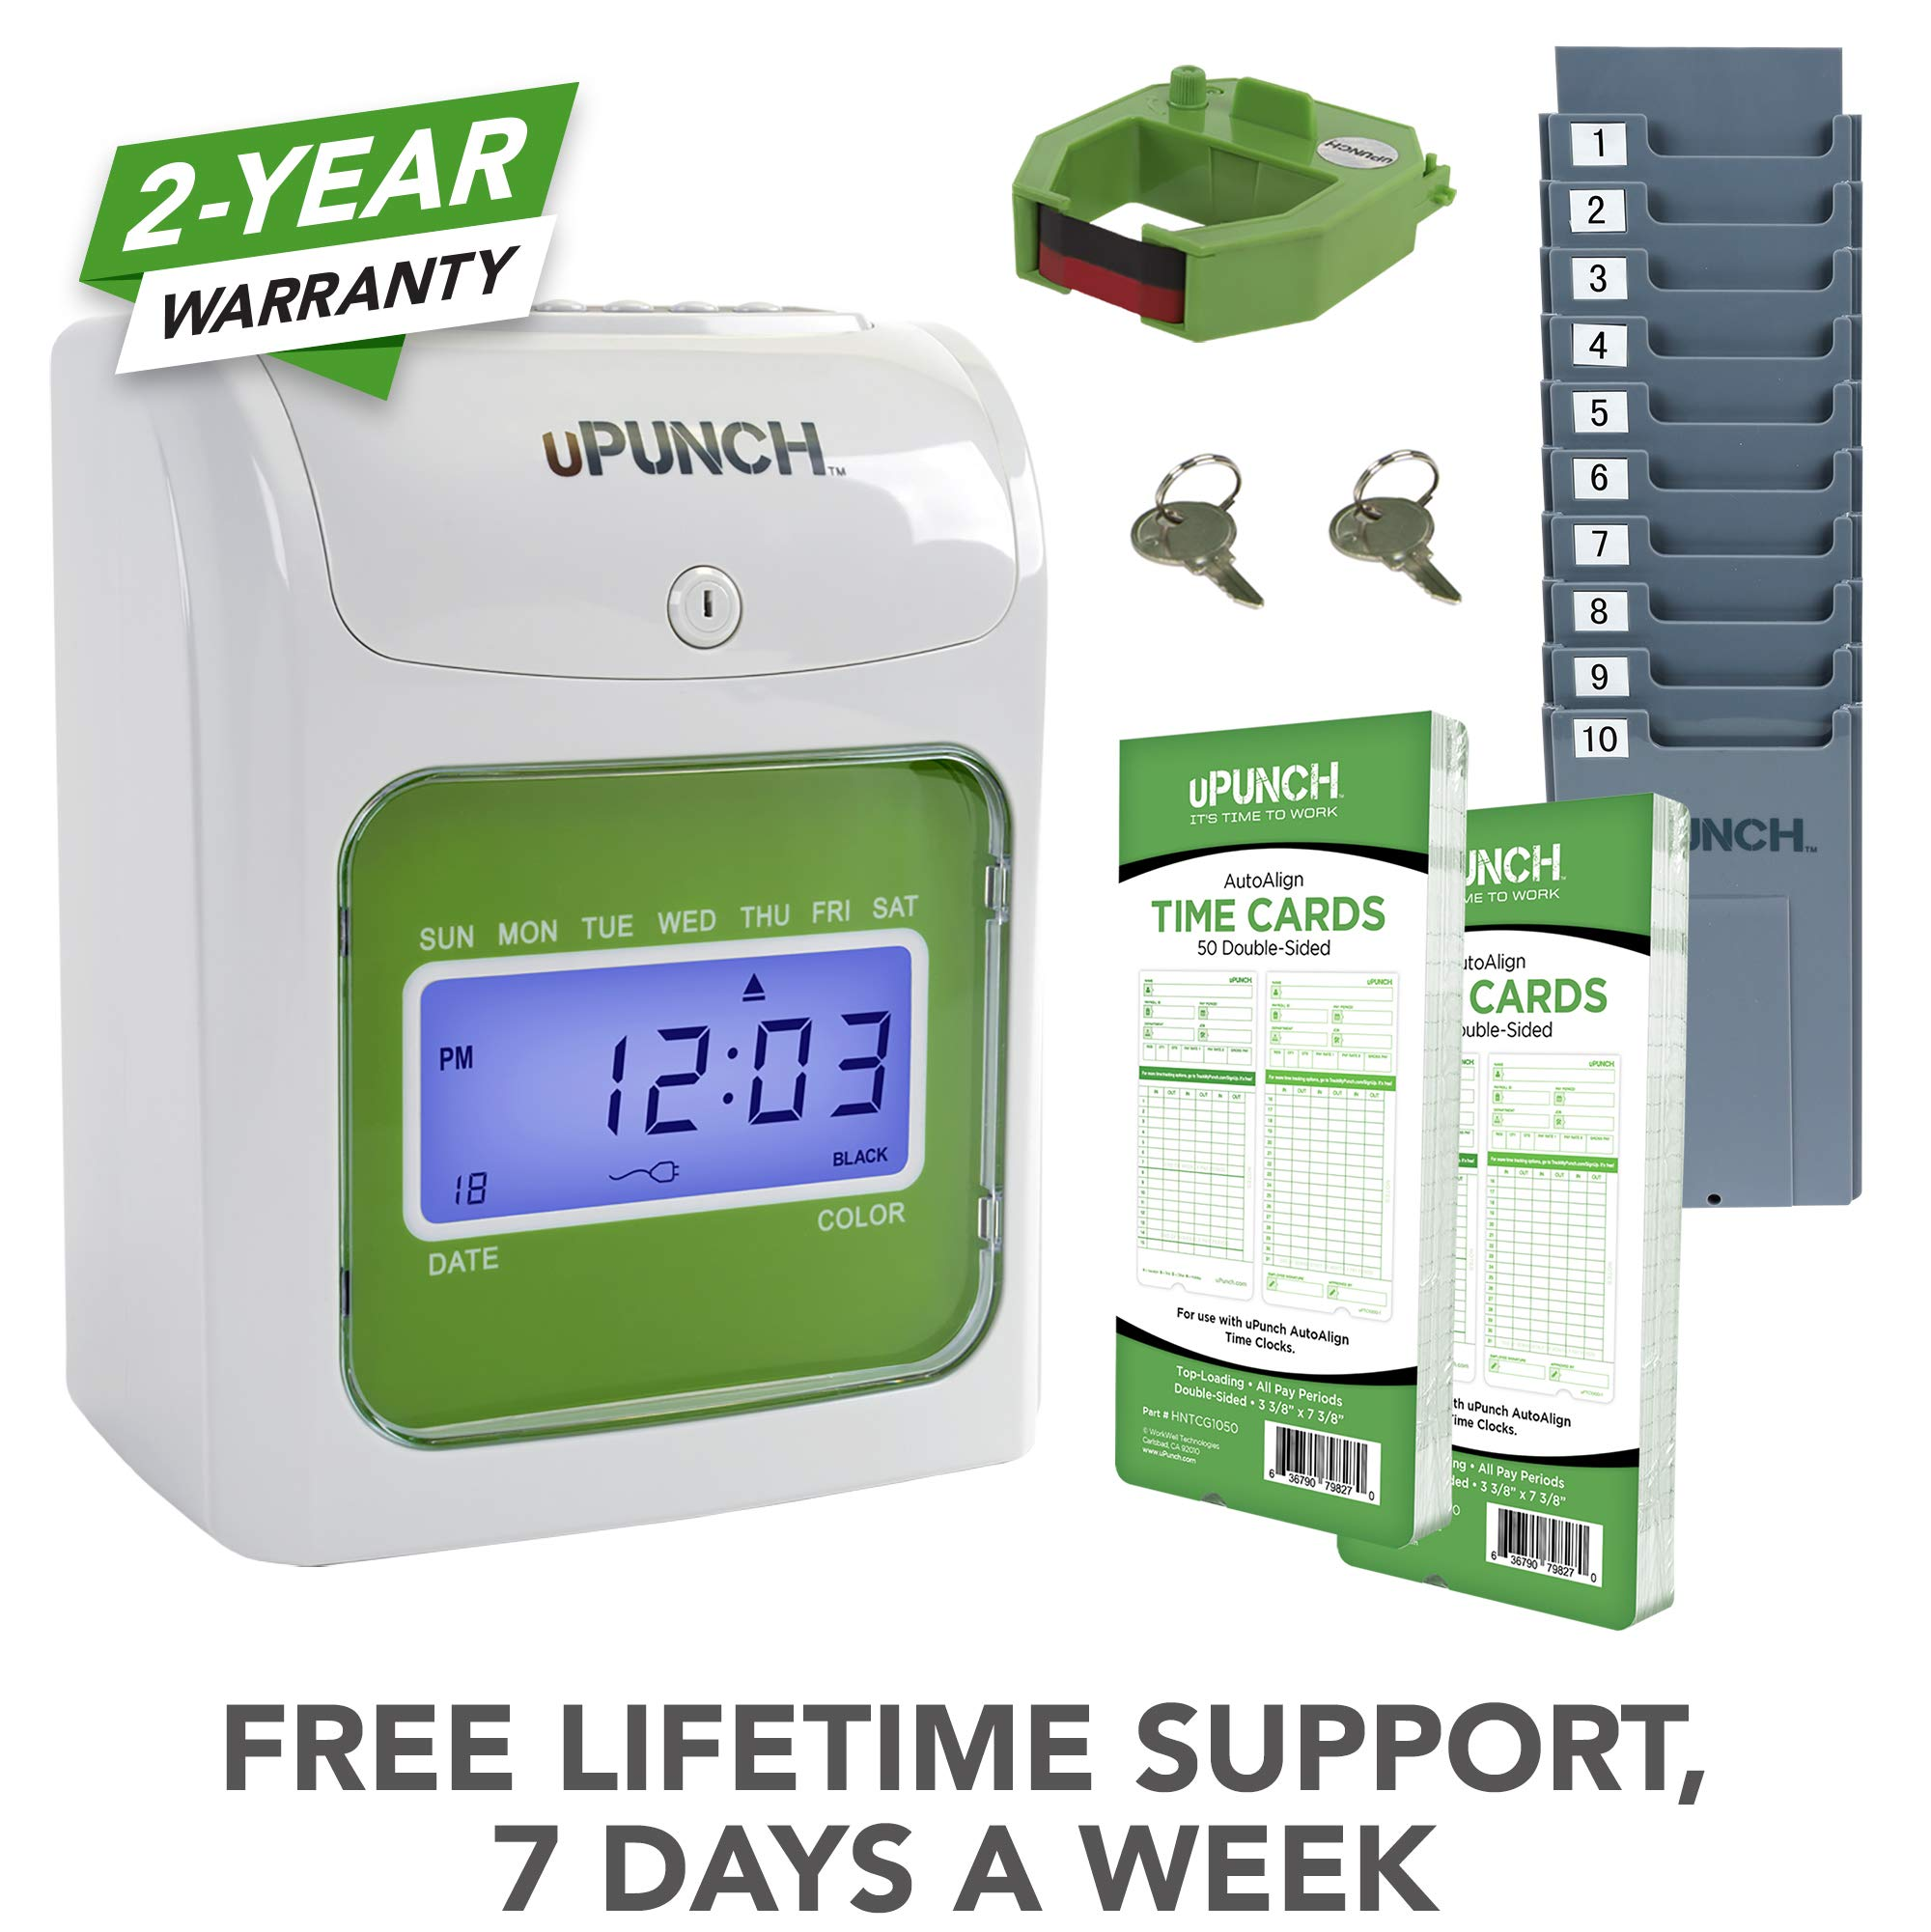 uPunch Starter Time Clock Bundle with 100-Cards, 1 Time Card Rack, 1 Ribbon & 2 Keys (HN1500)